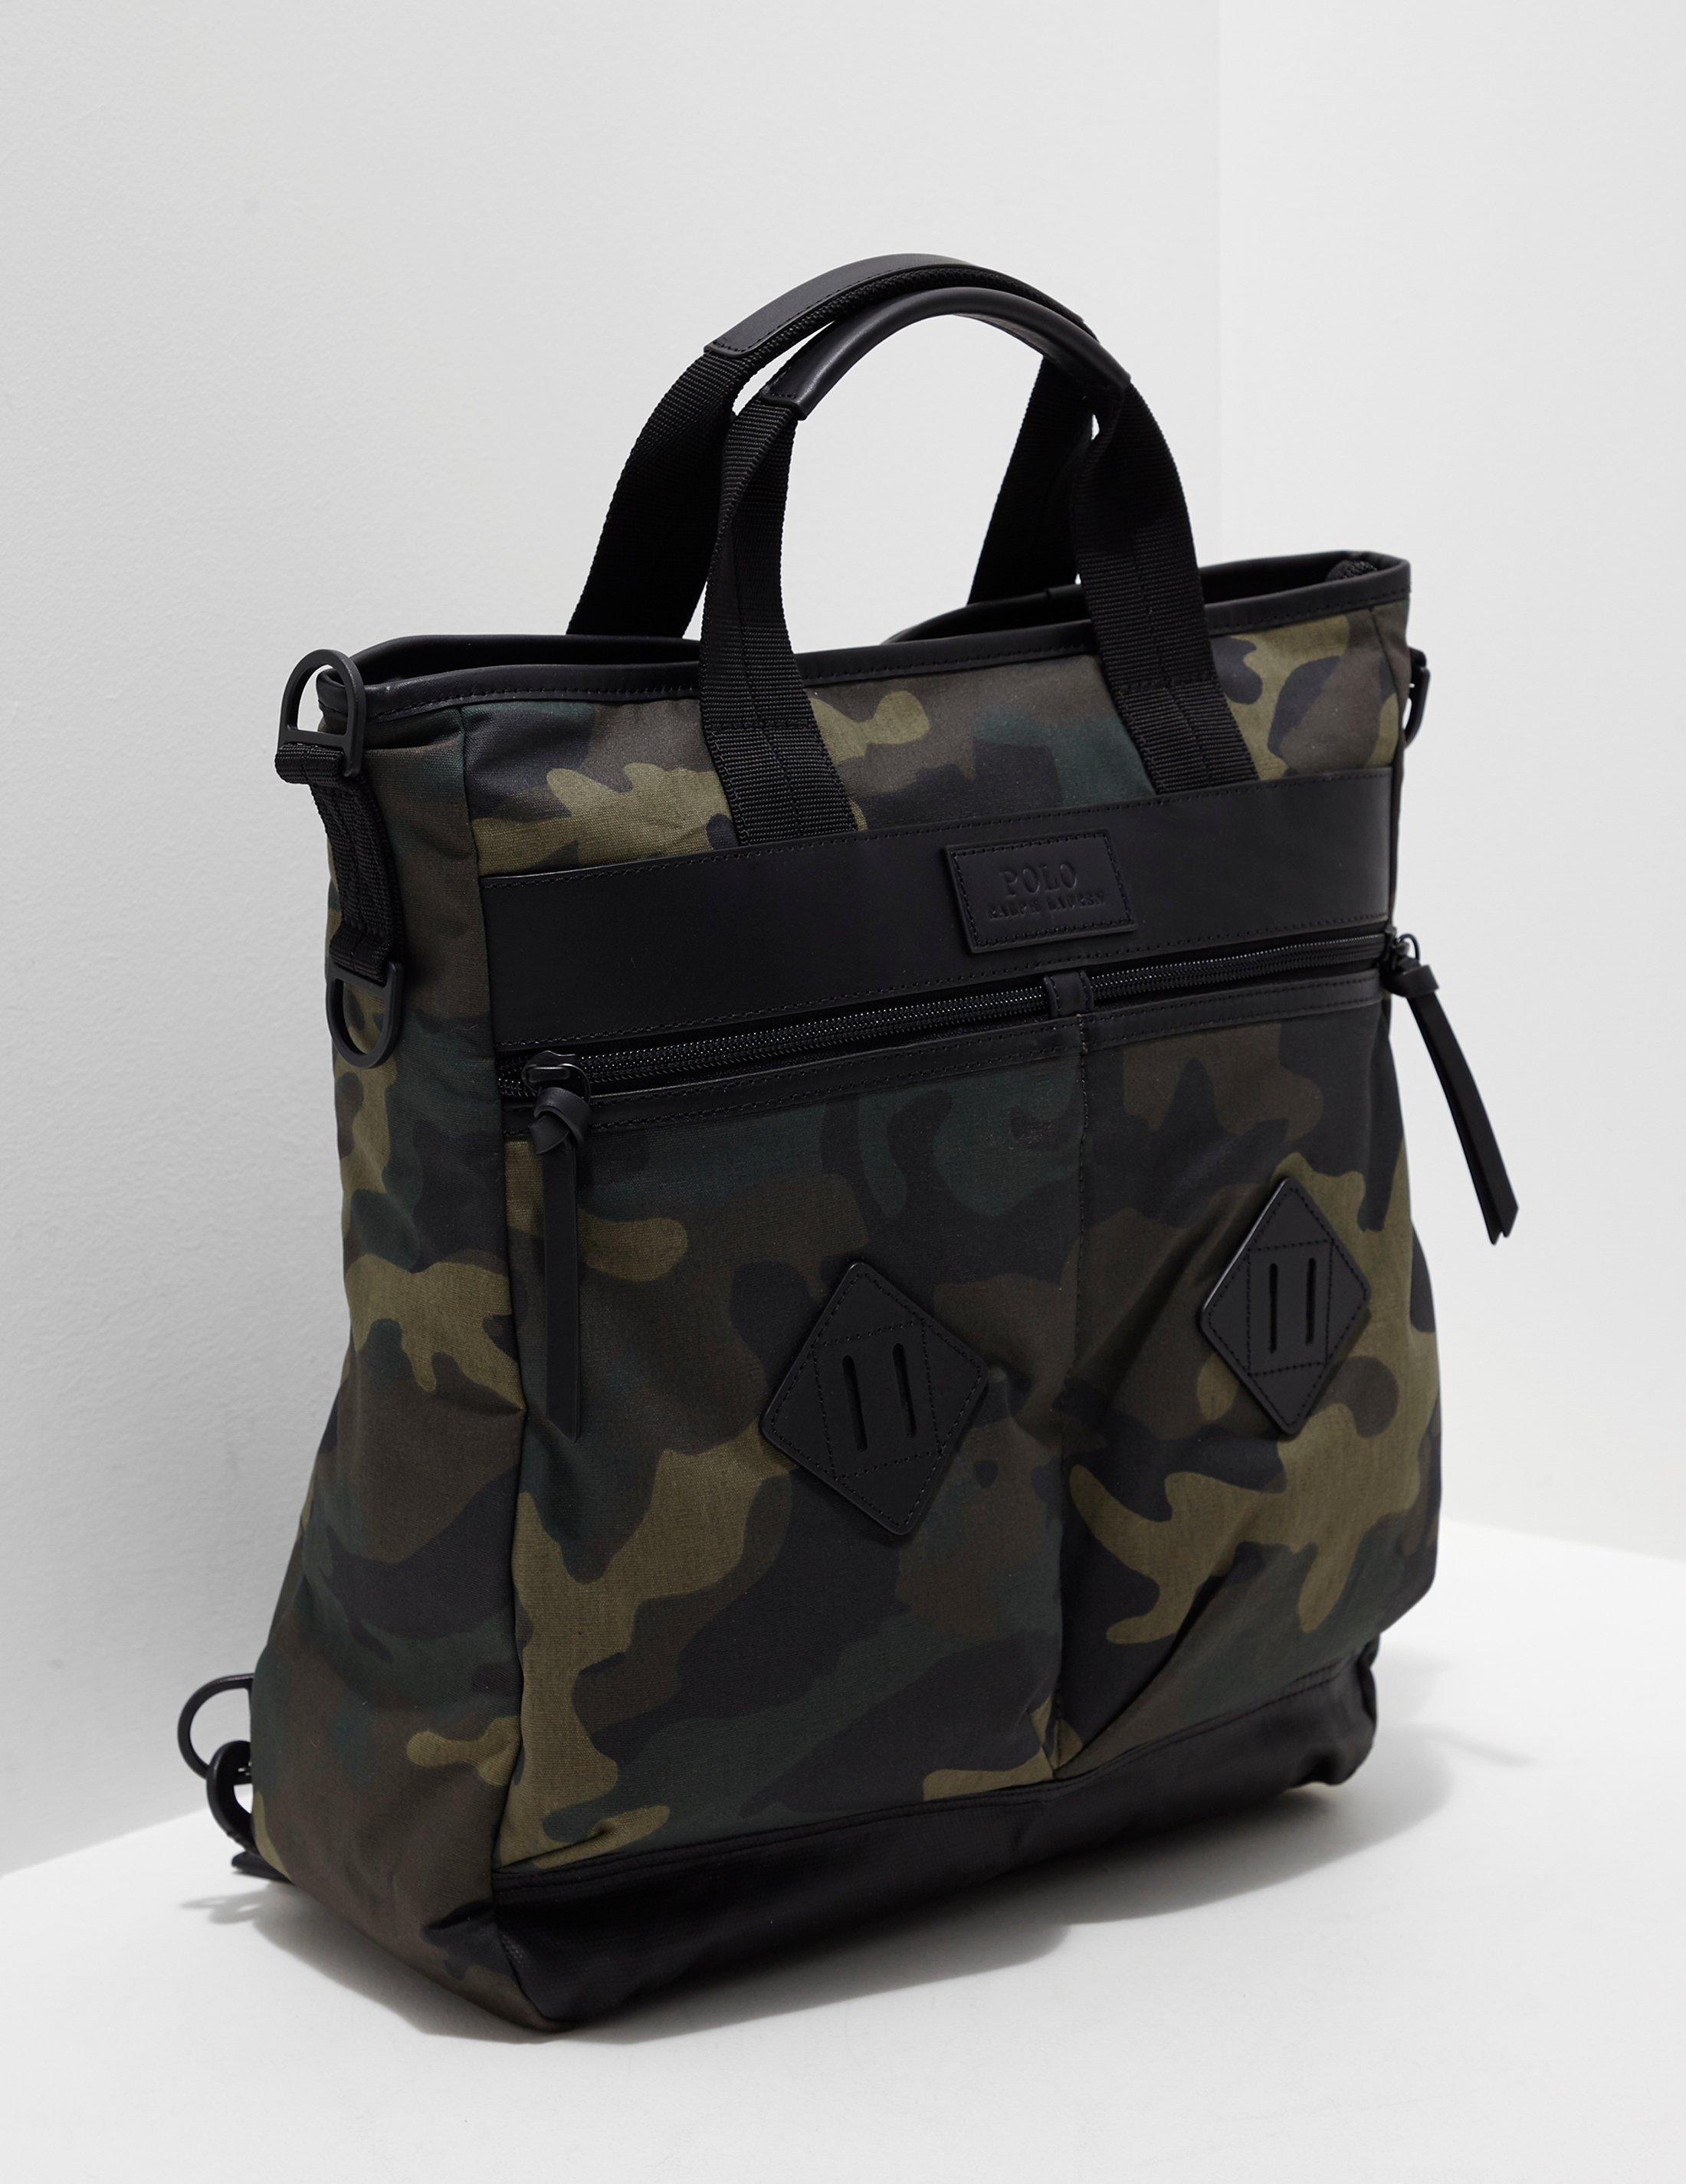 6e2ab4e8c5ff Polo Ralph Lauren Mens Tote Bag - Online Exclusive Green in Green ...